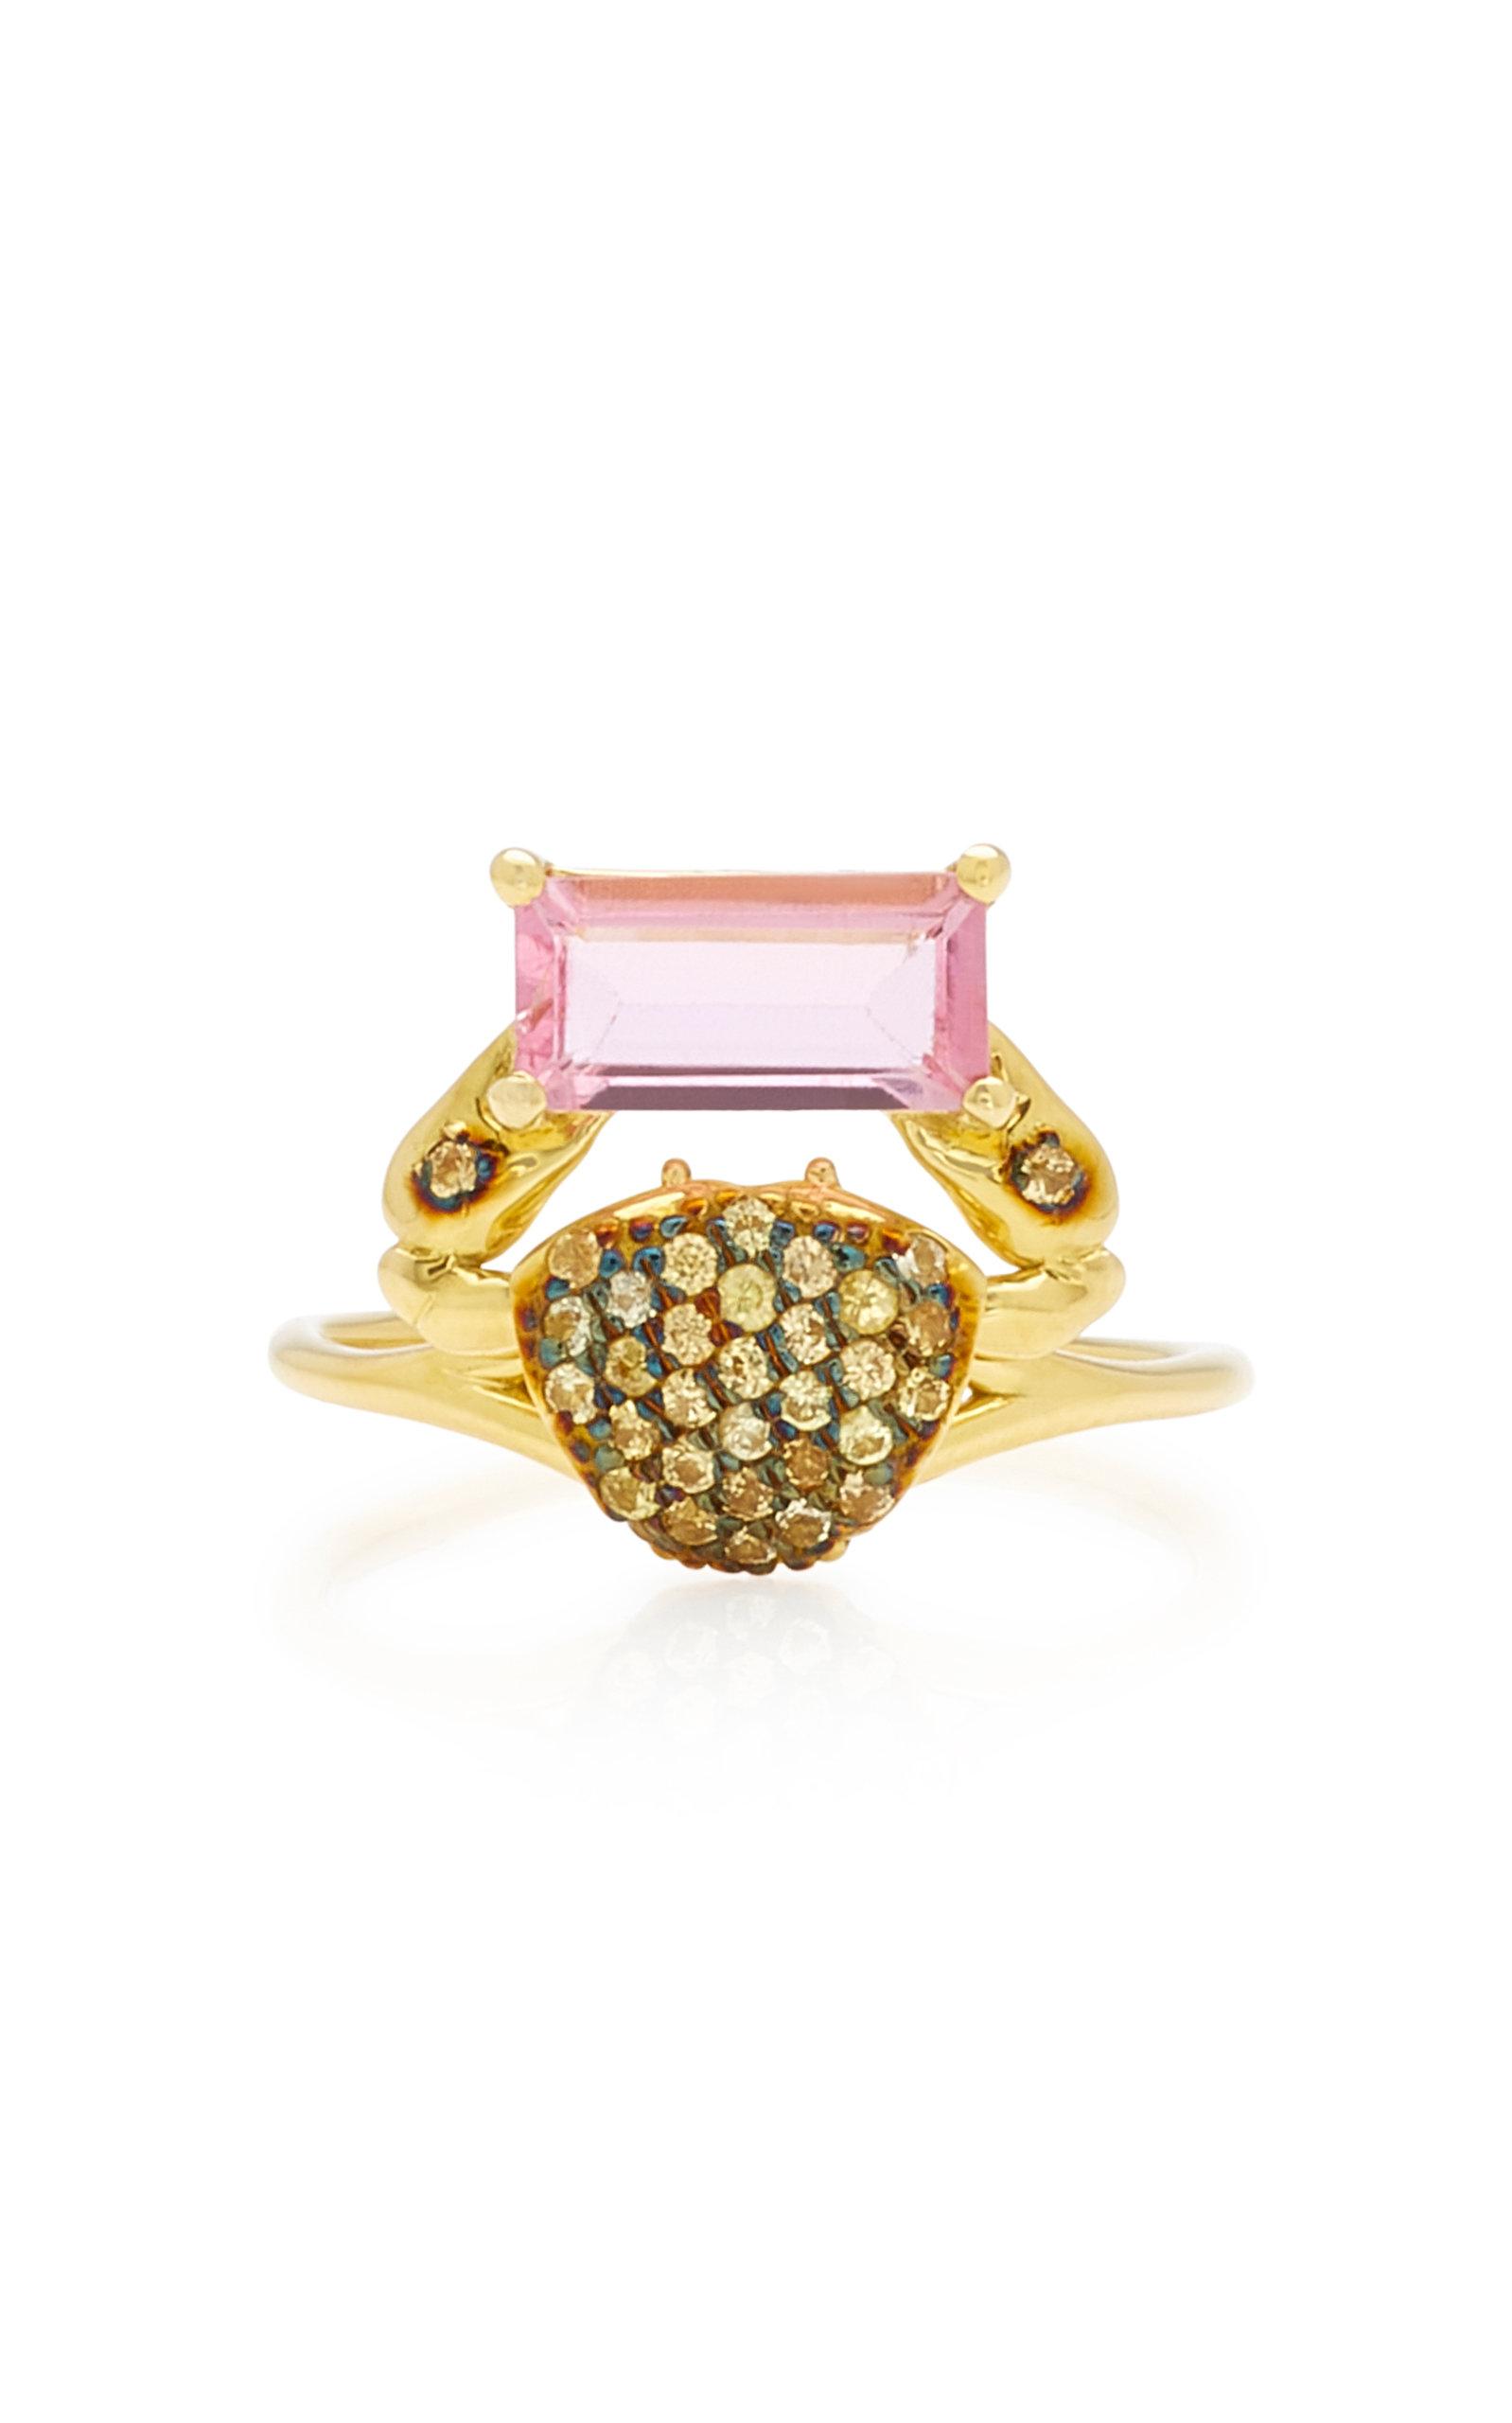 Women's Cosquilleo 18K Gold; Tourmaline and Sapphire Ring